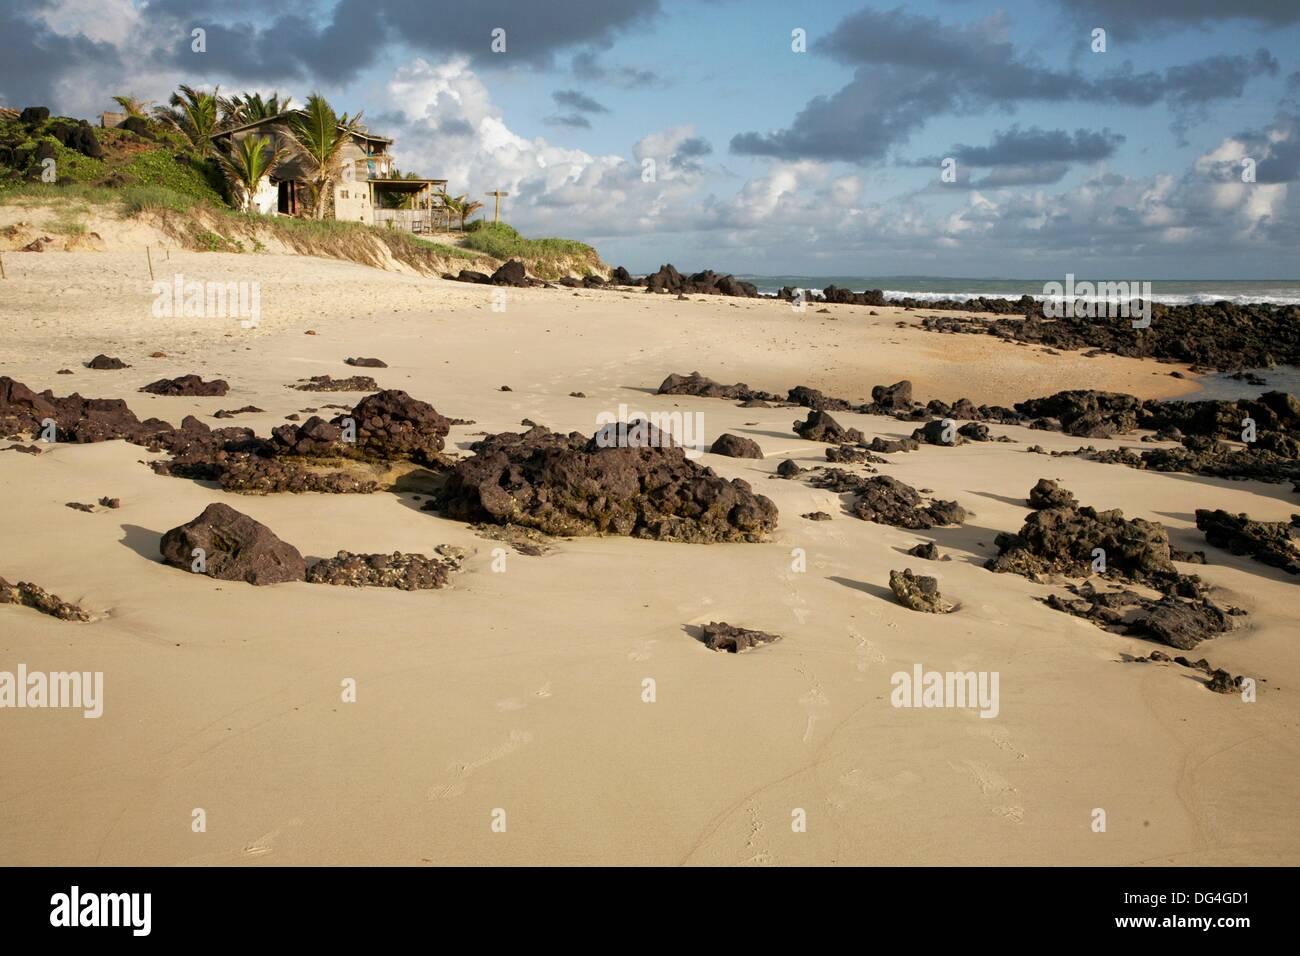 Praia do Amor, playa de Pipa. Tibau do Sul, Rio Grande do Norte, Brasil Imagen De Stock